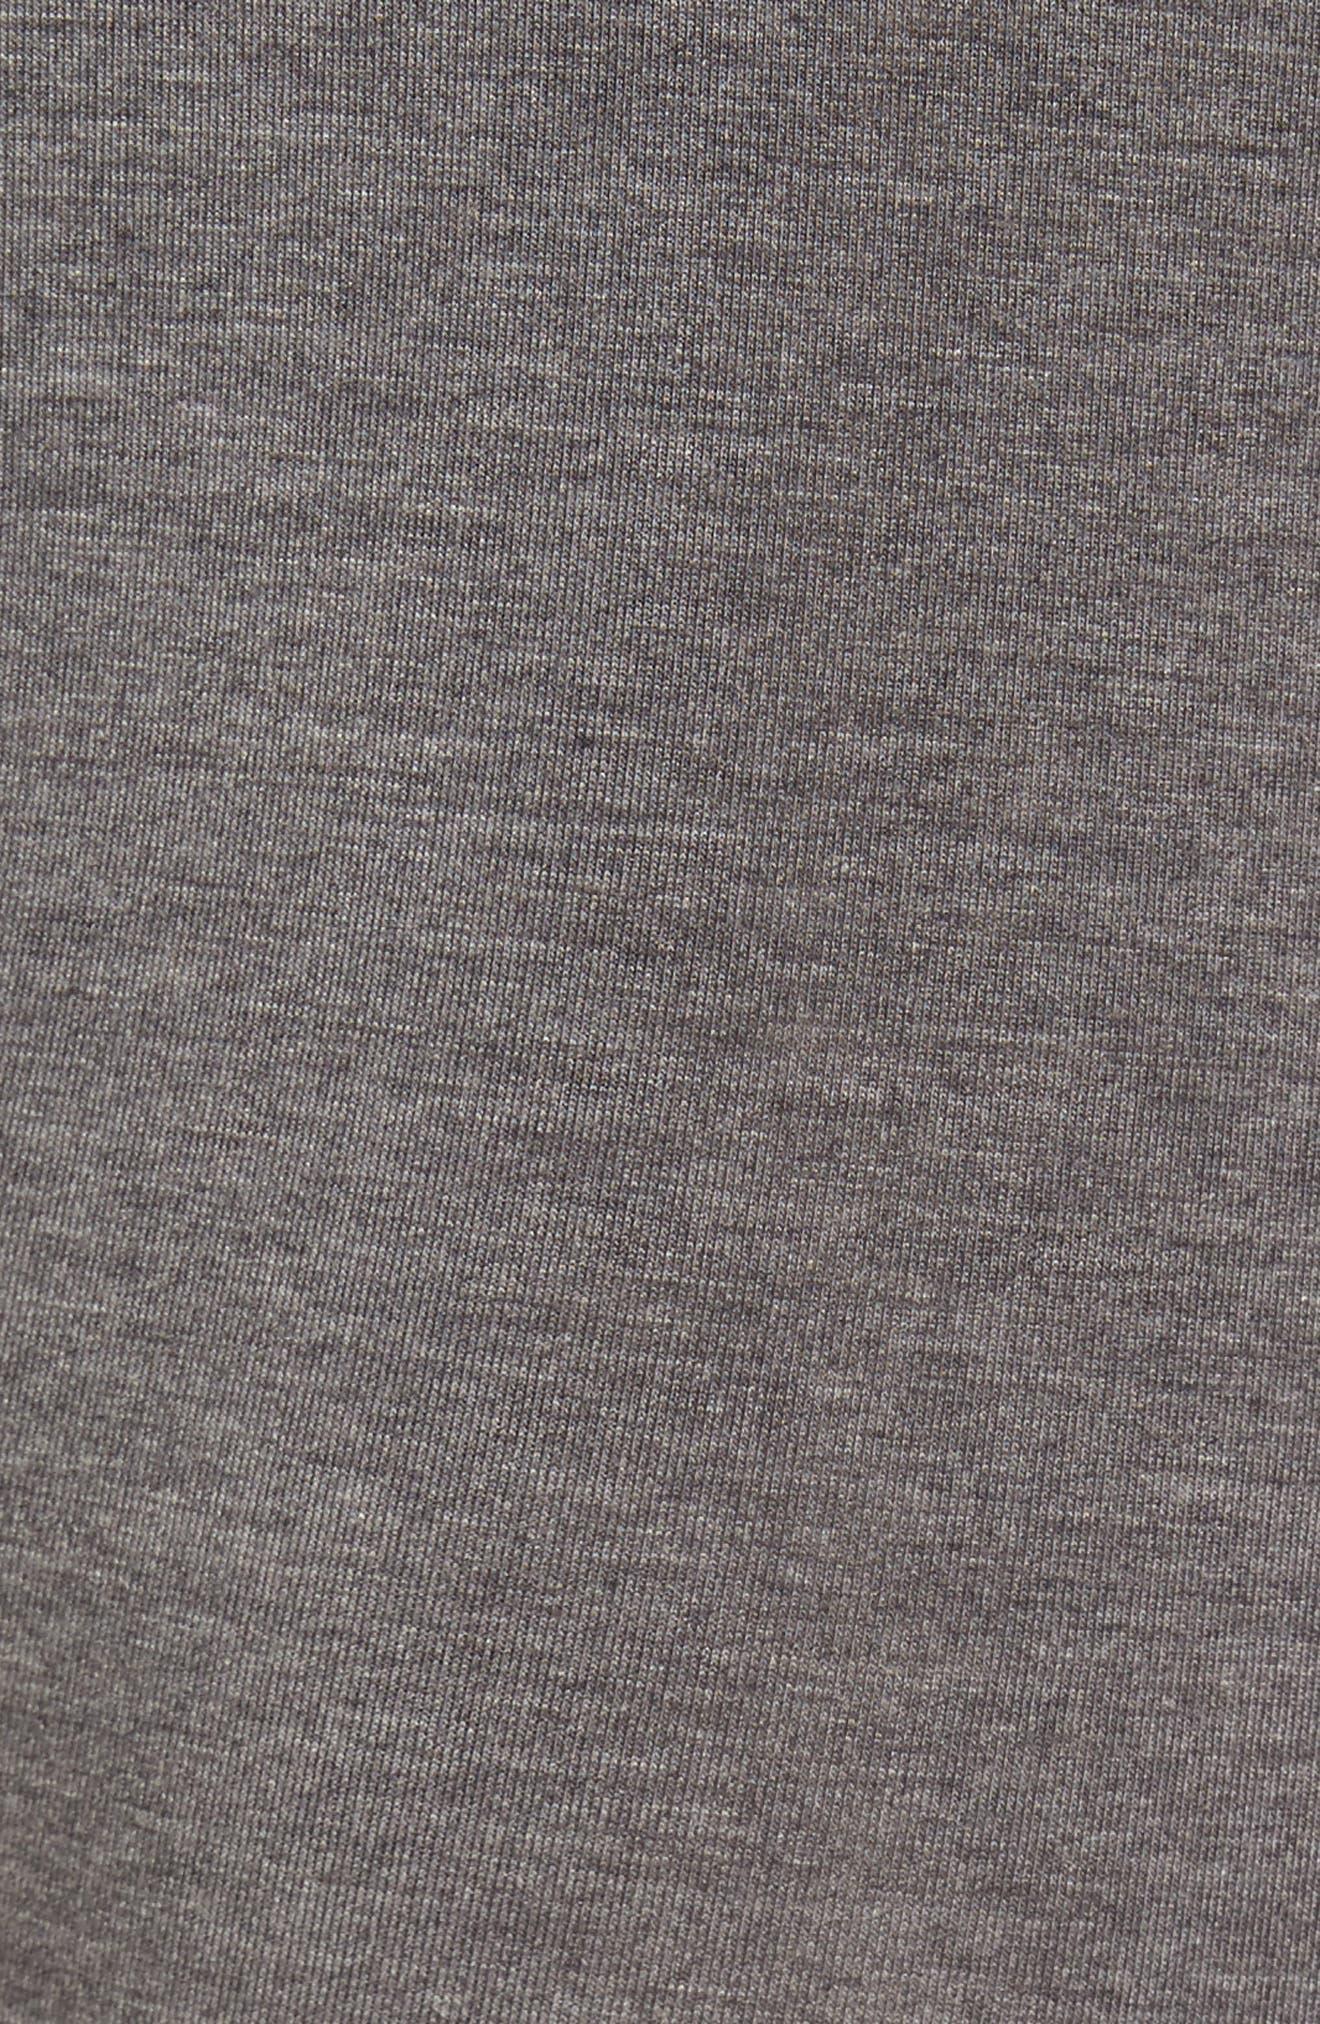 Thermal Long Johns,                             Alternate thumbnail 5, color,                             Charcoal